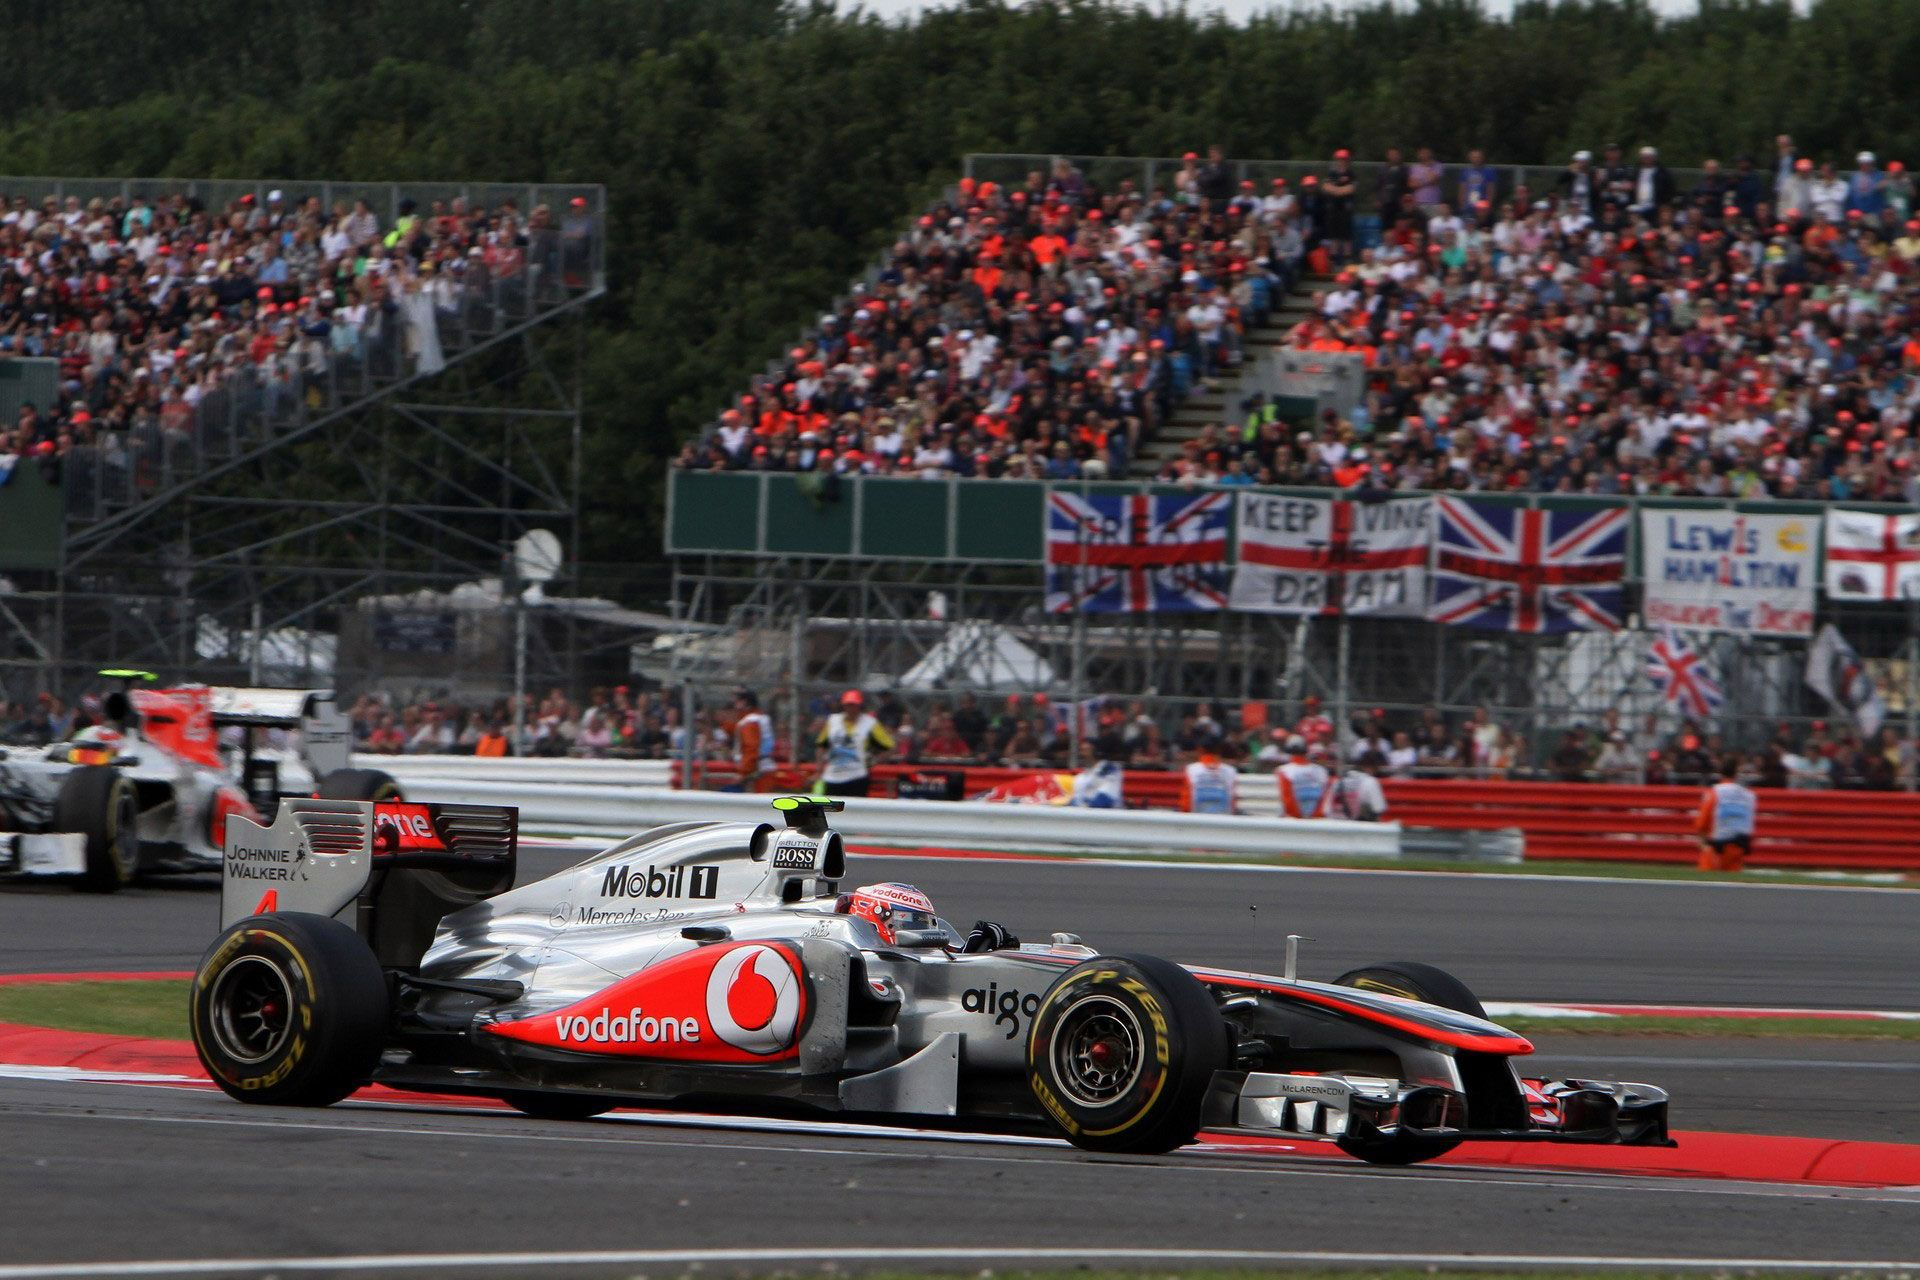 British Gp Silverstone Circuit Race F1 Grand Prix Http Vipsaccess Com British Grand Prix Racing Circuit Racing